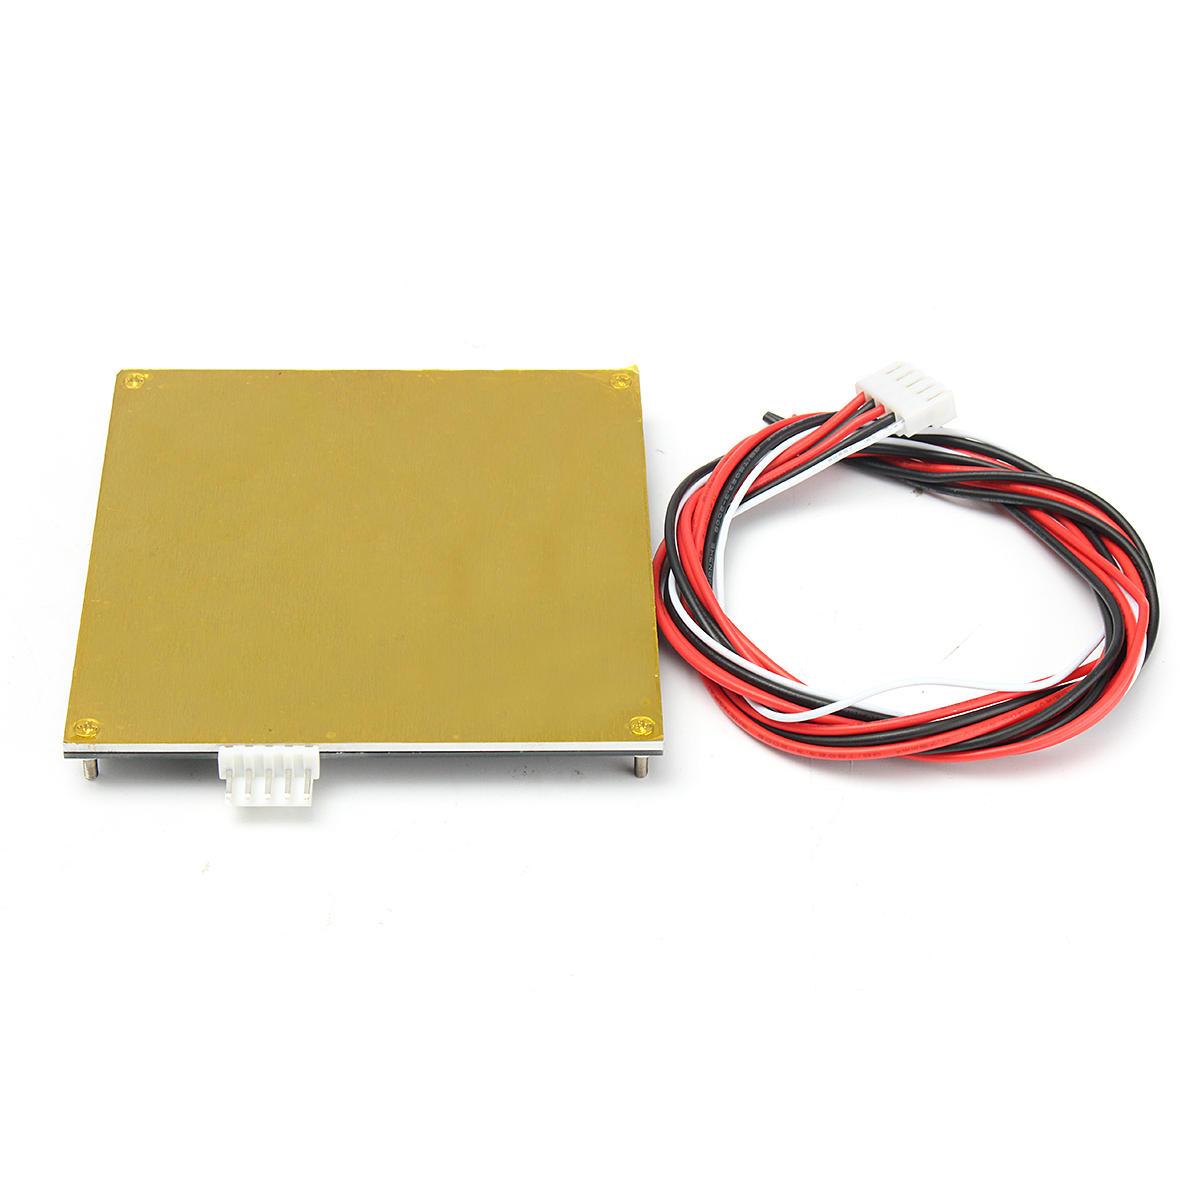 PCB Heated Bed 120*120mm 12V Kit For Mendel RepRap 3D Printer